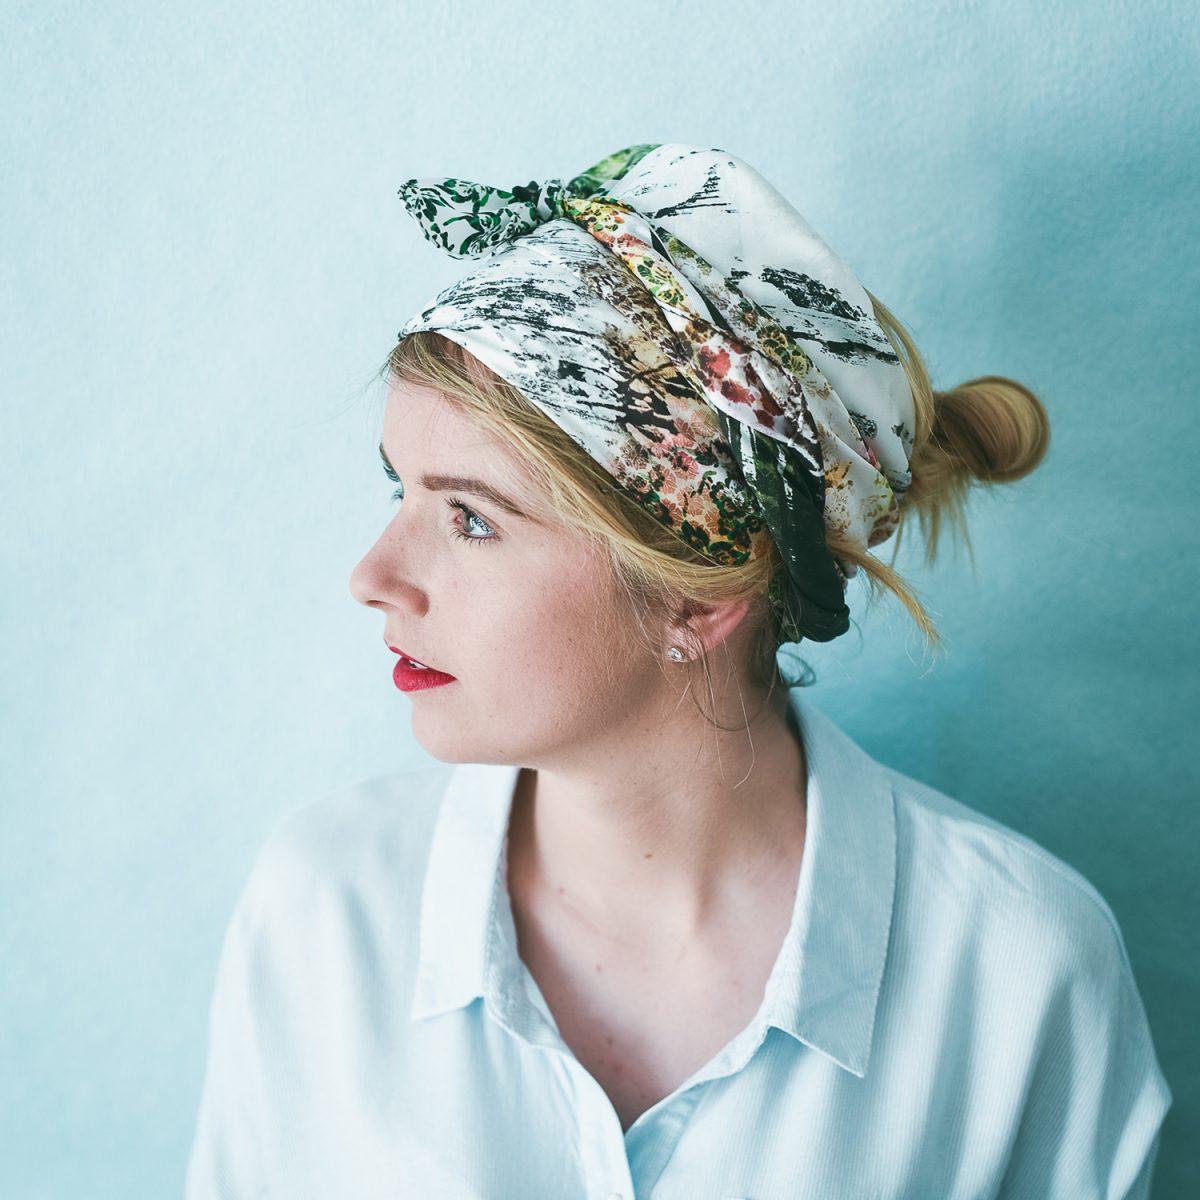 Âmulet Foulard HOZAN JI fashion headwrapped style